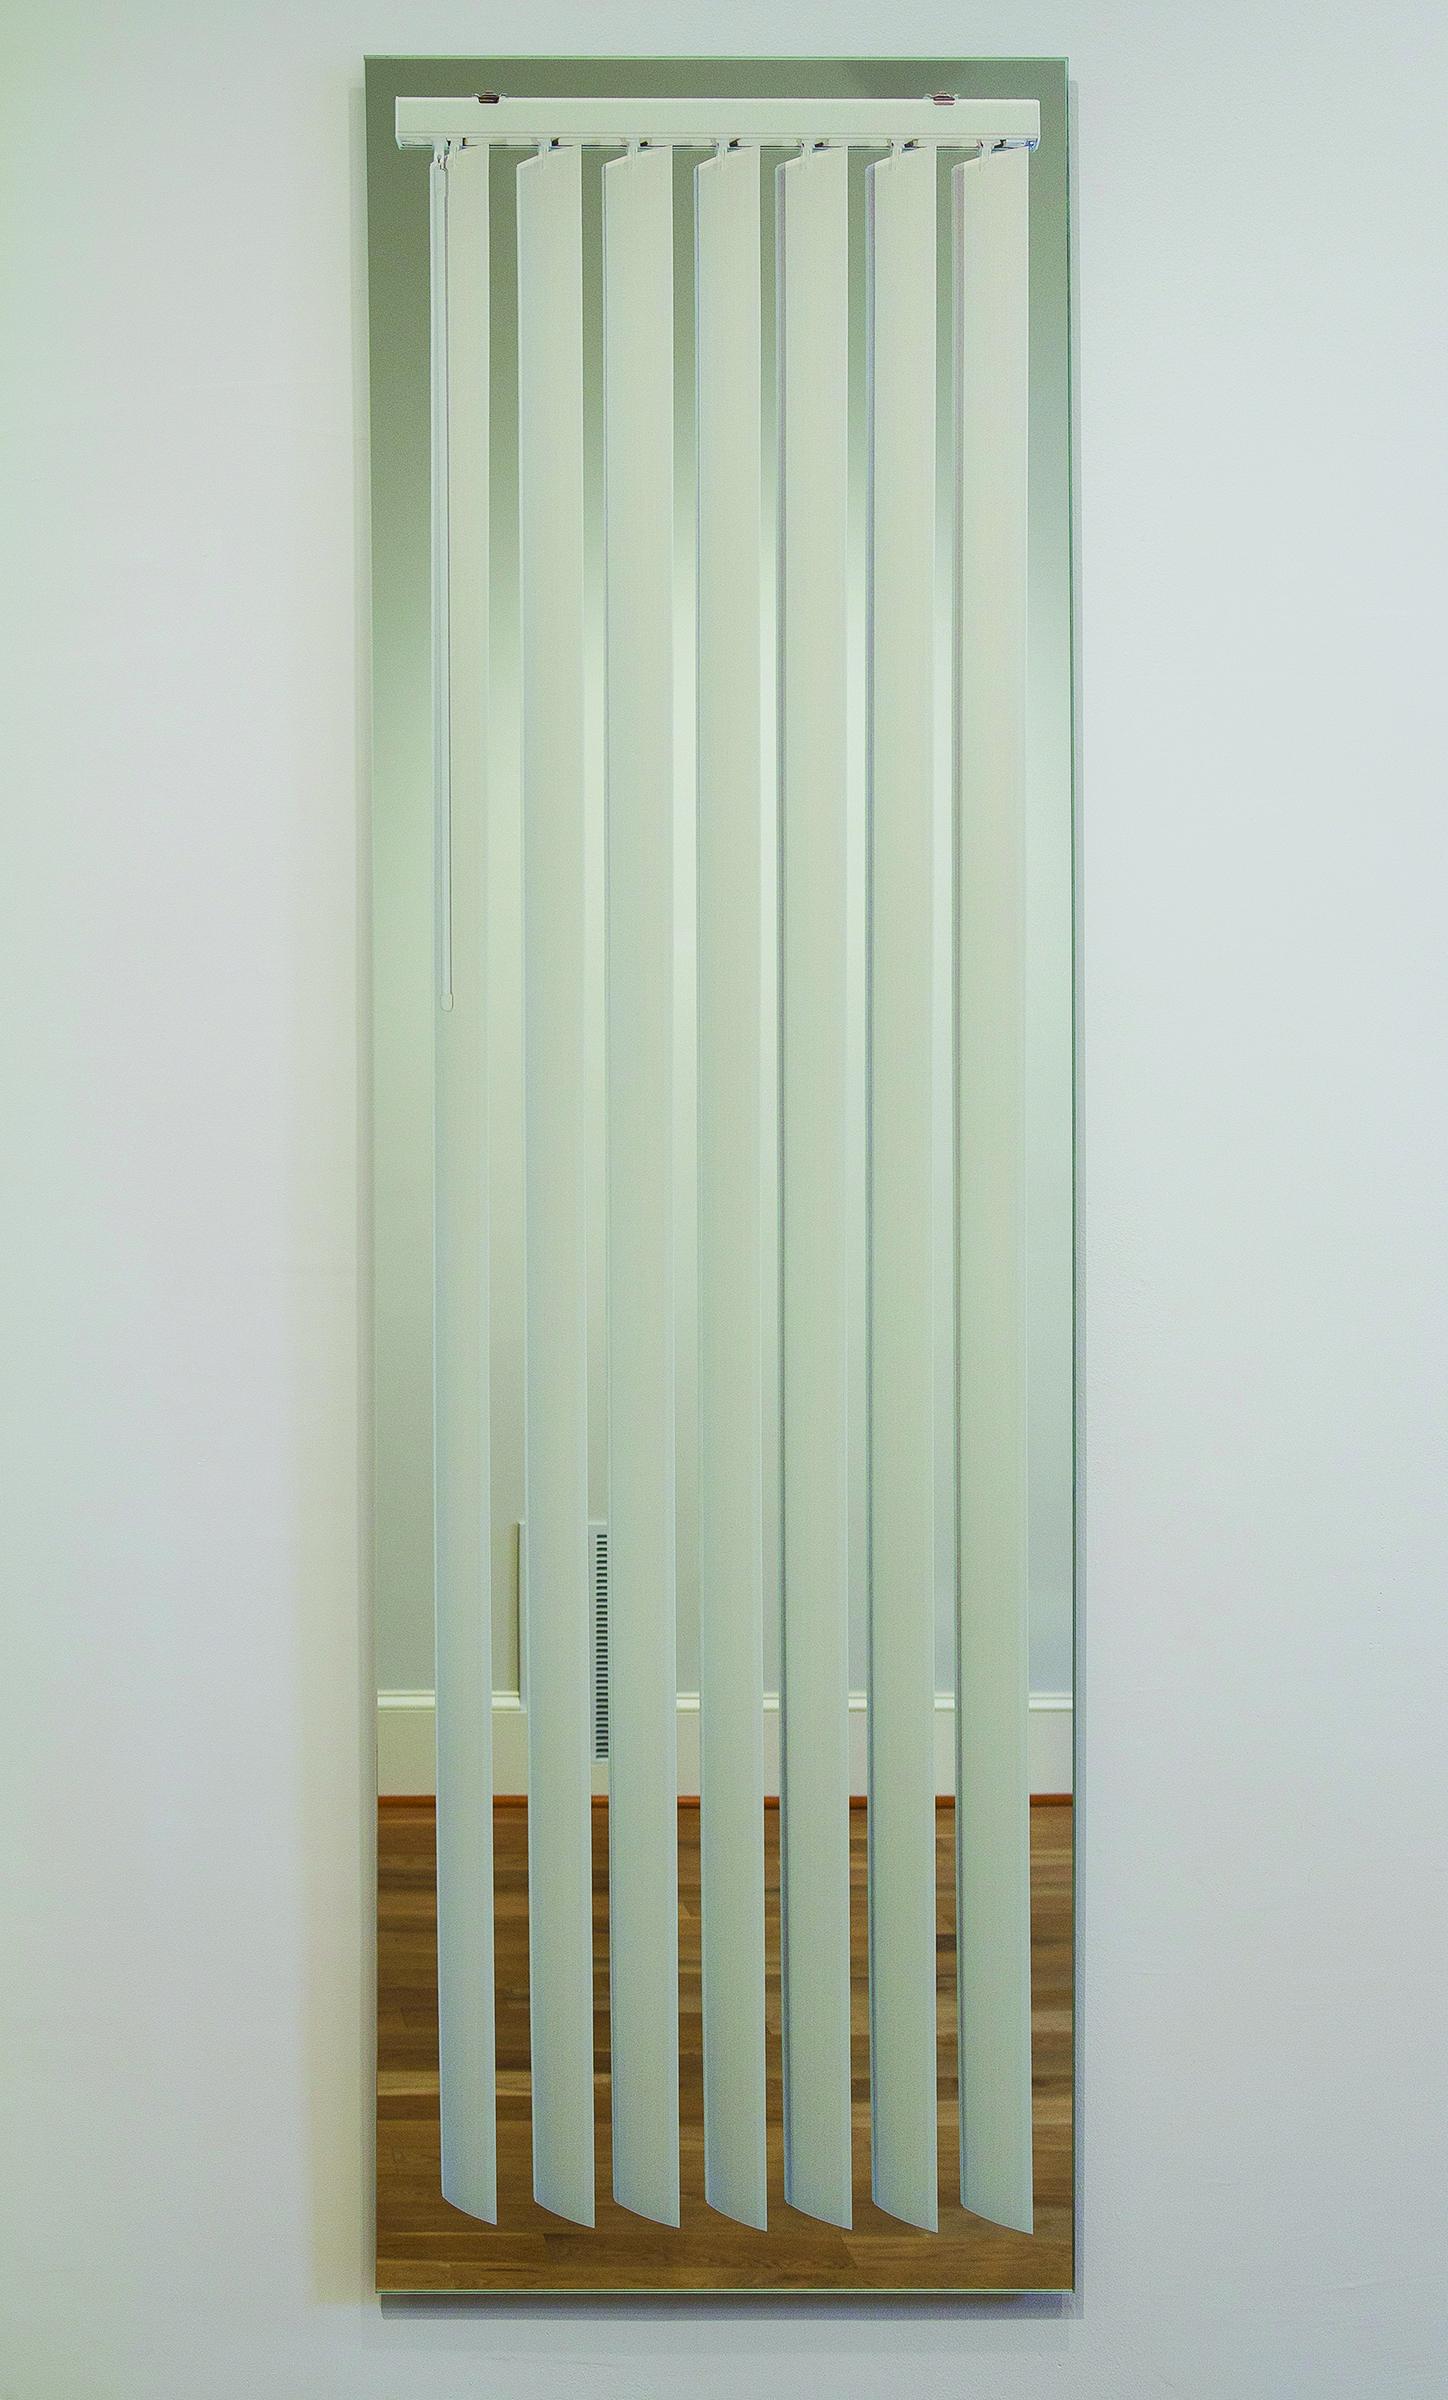 LisaDillin_Window_E Vertical_Blinds_on_Mirror_2012.jpg